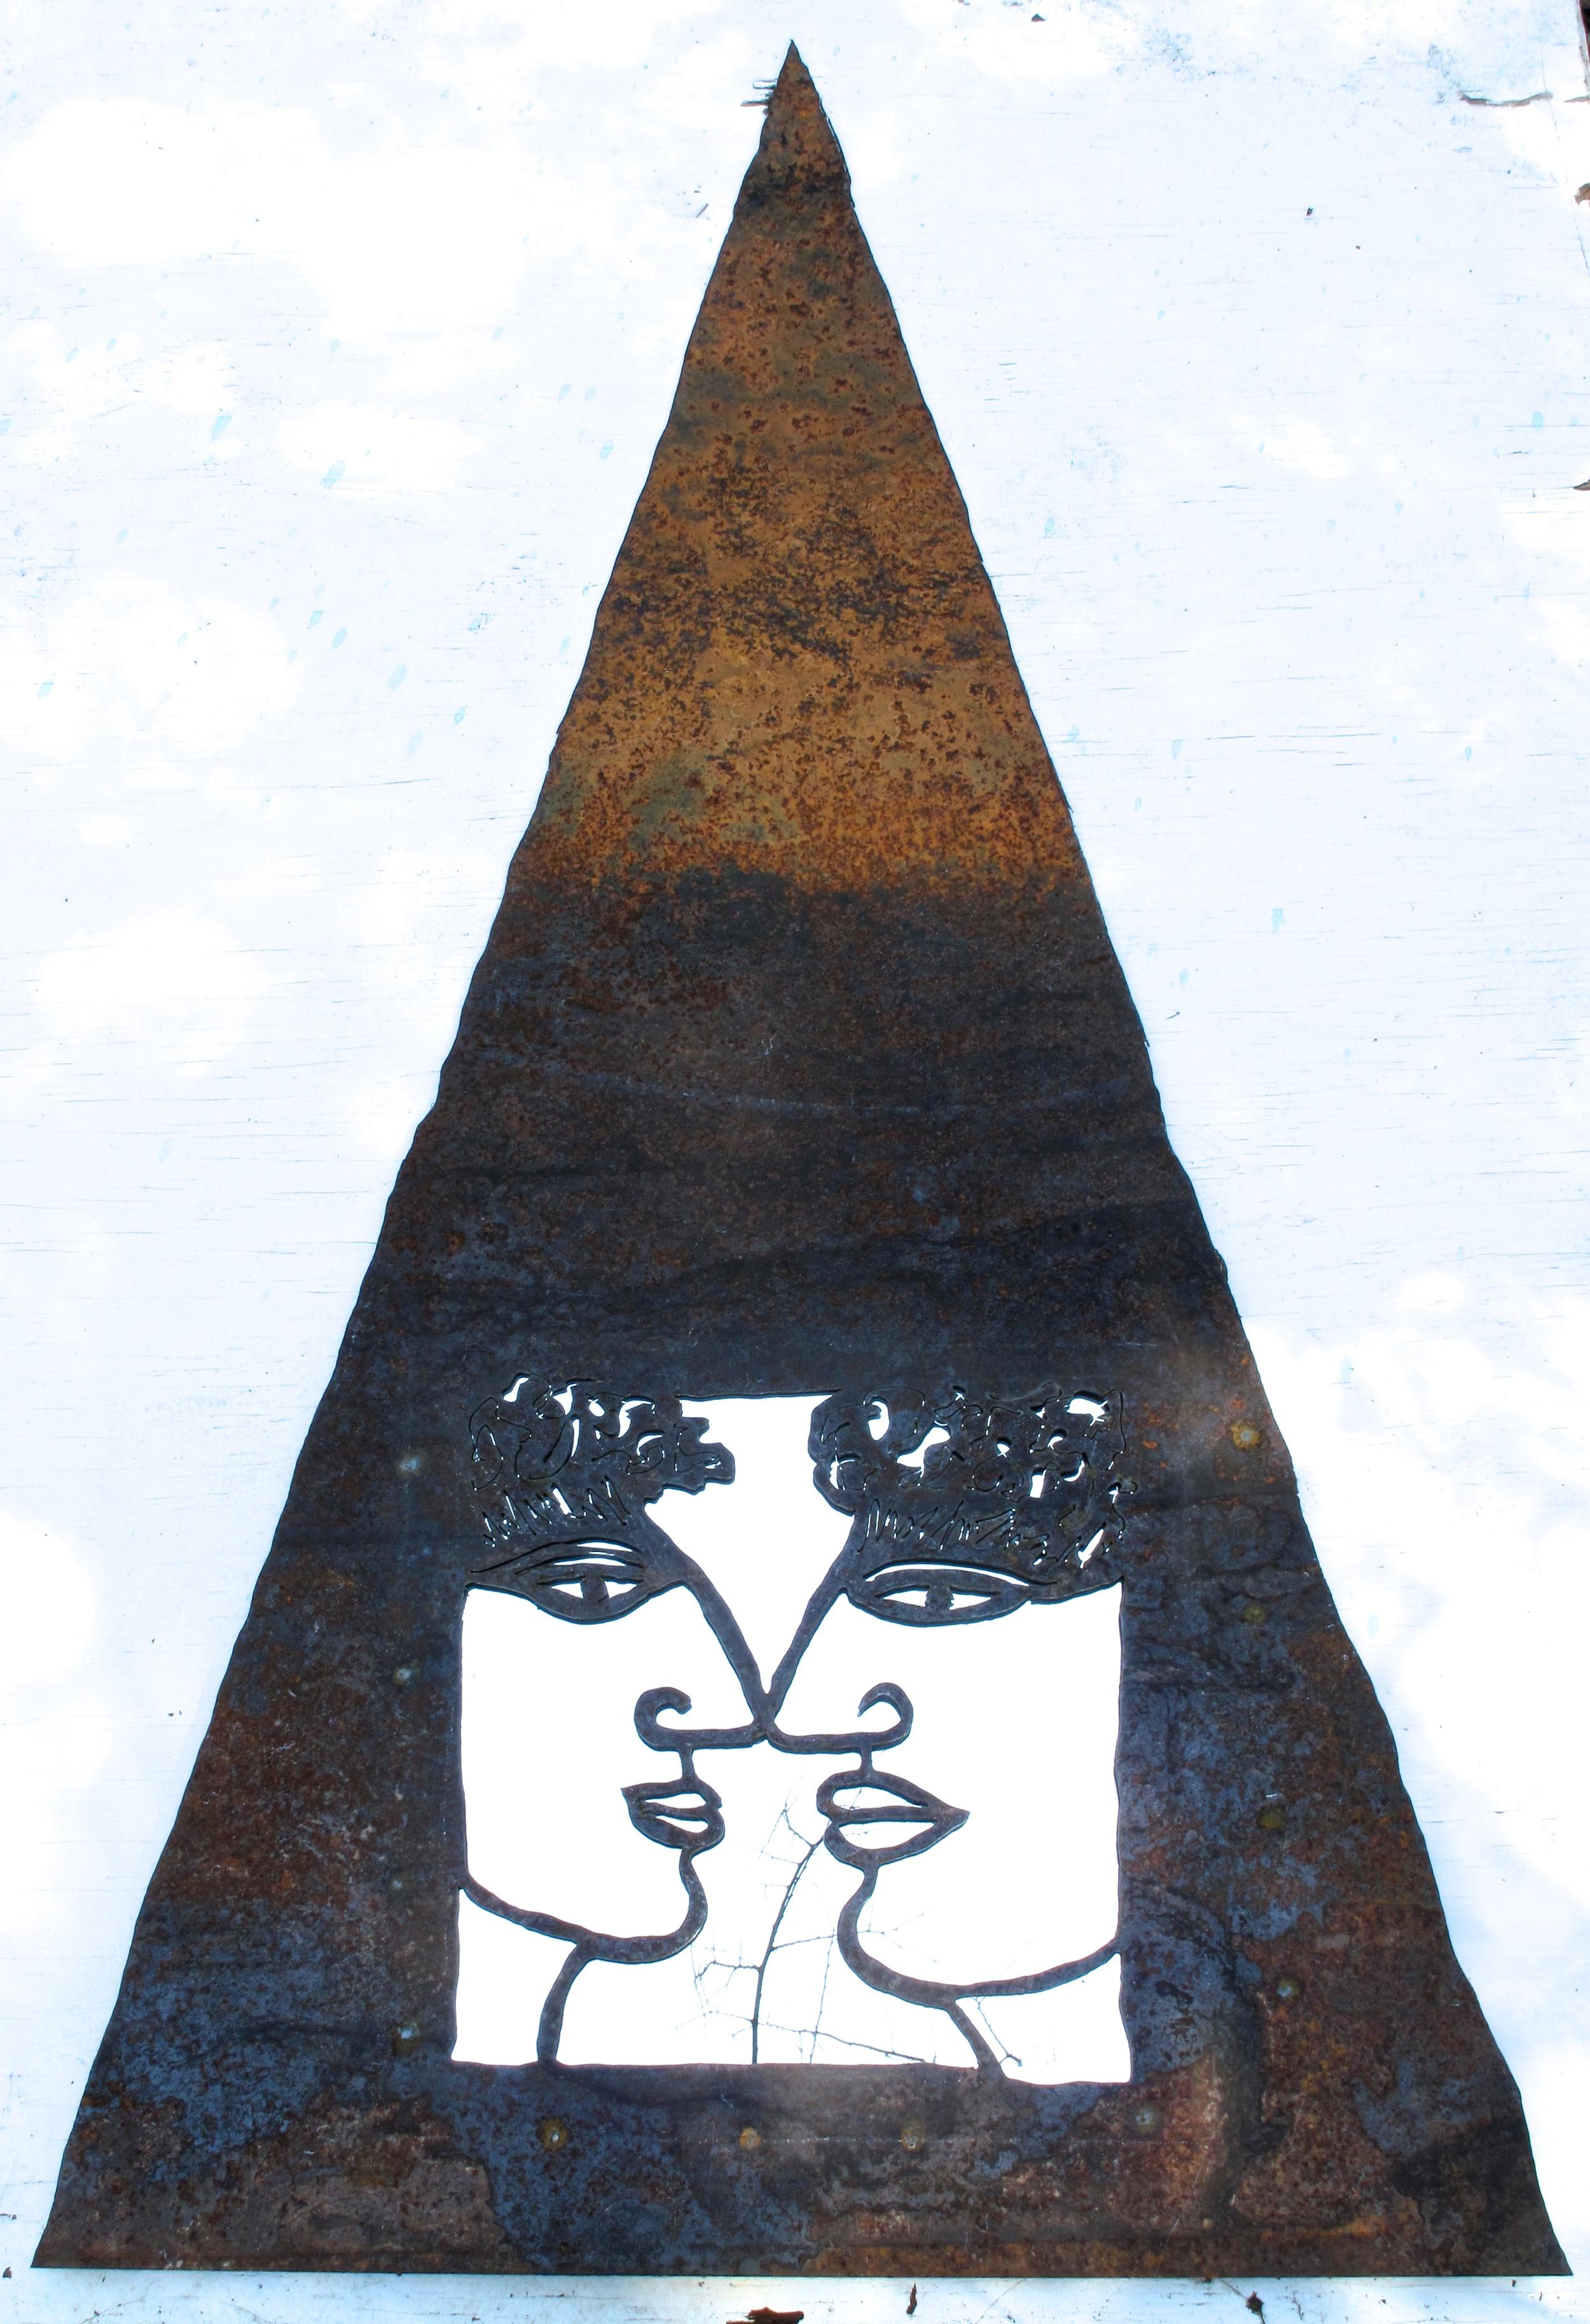 pyramid faces